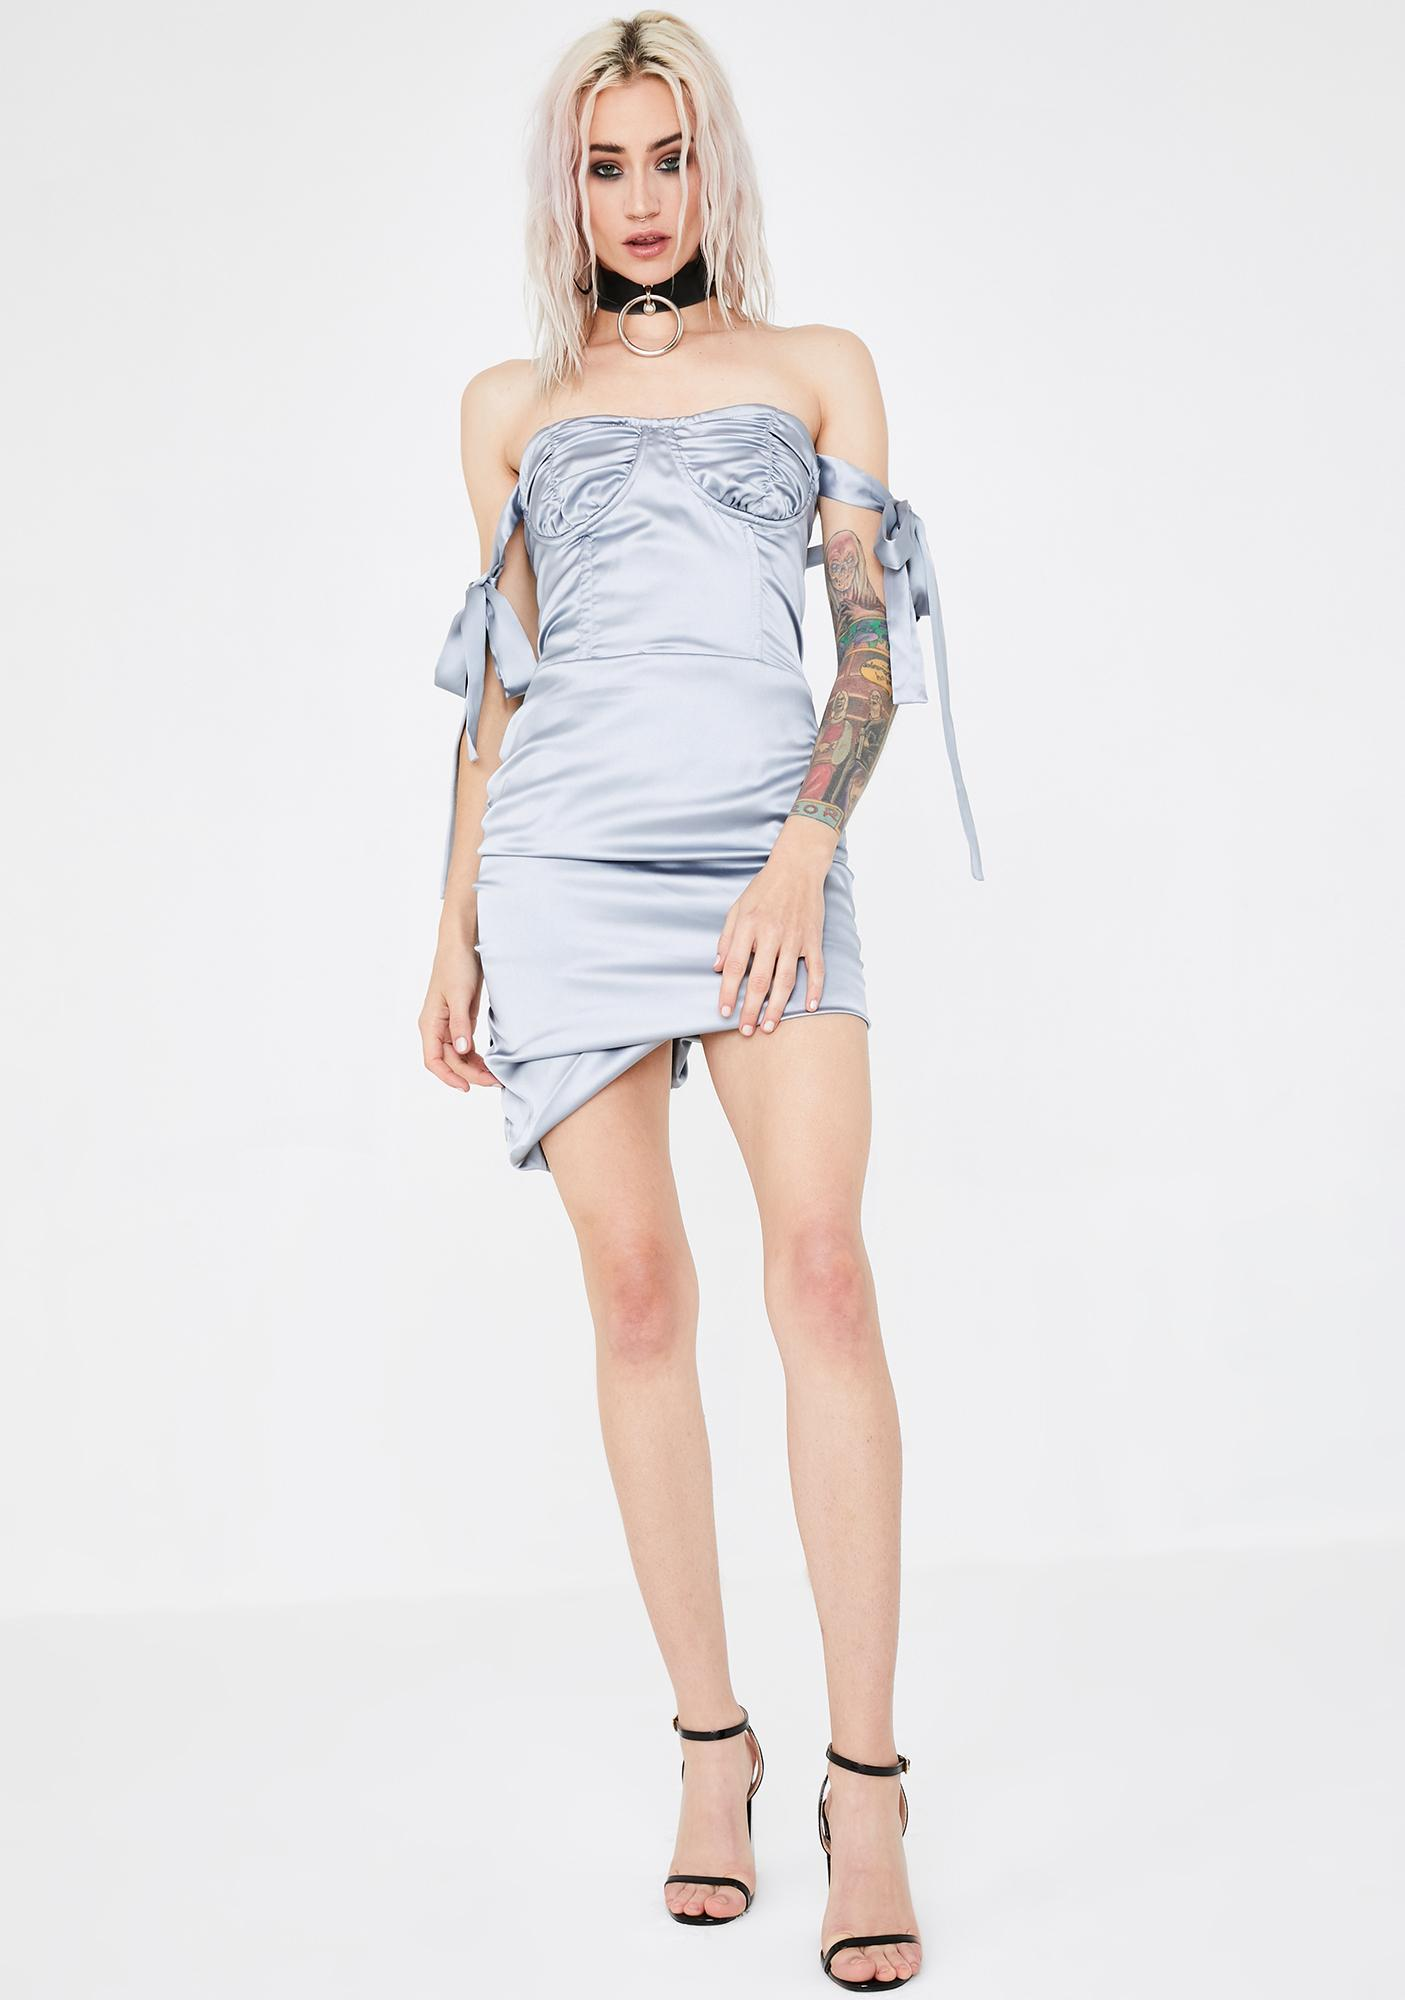 Lioness Silver Senorita Mini Dress